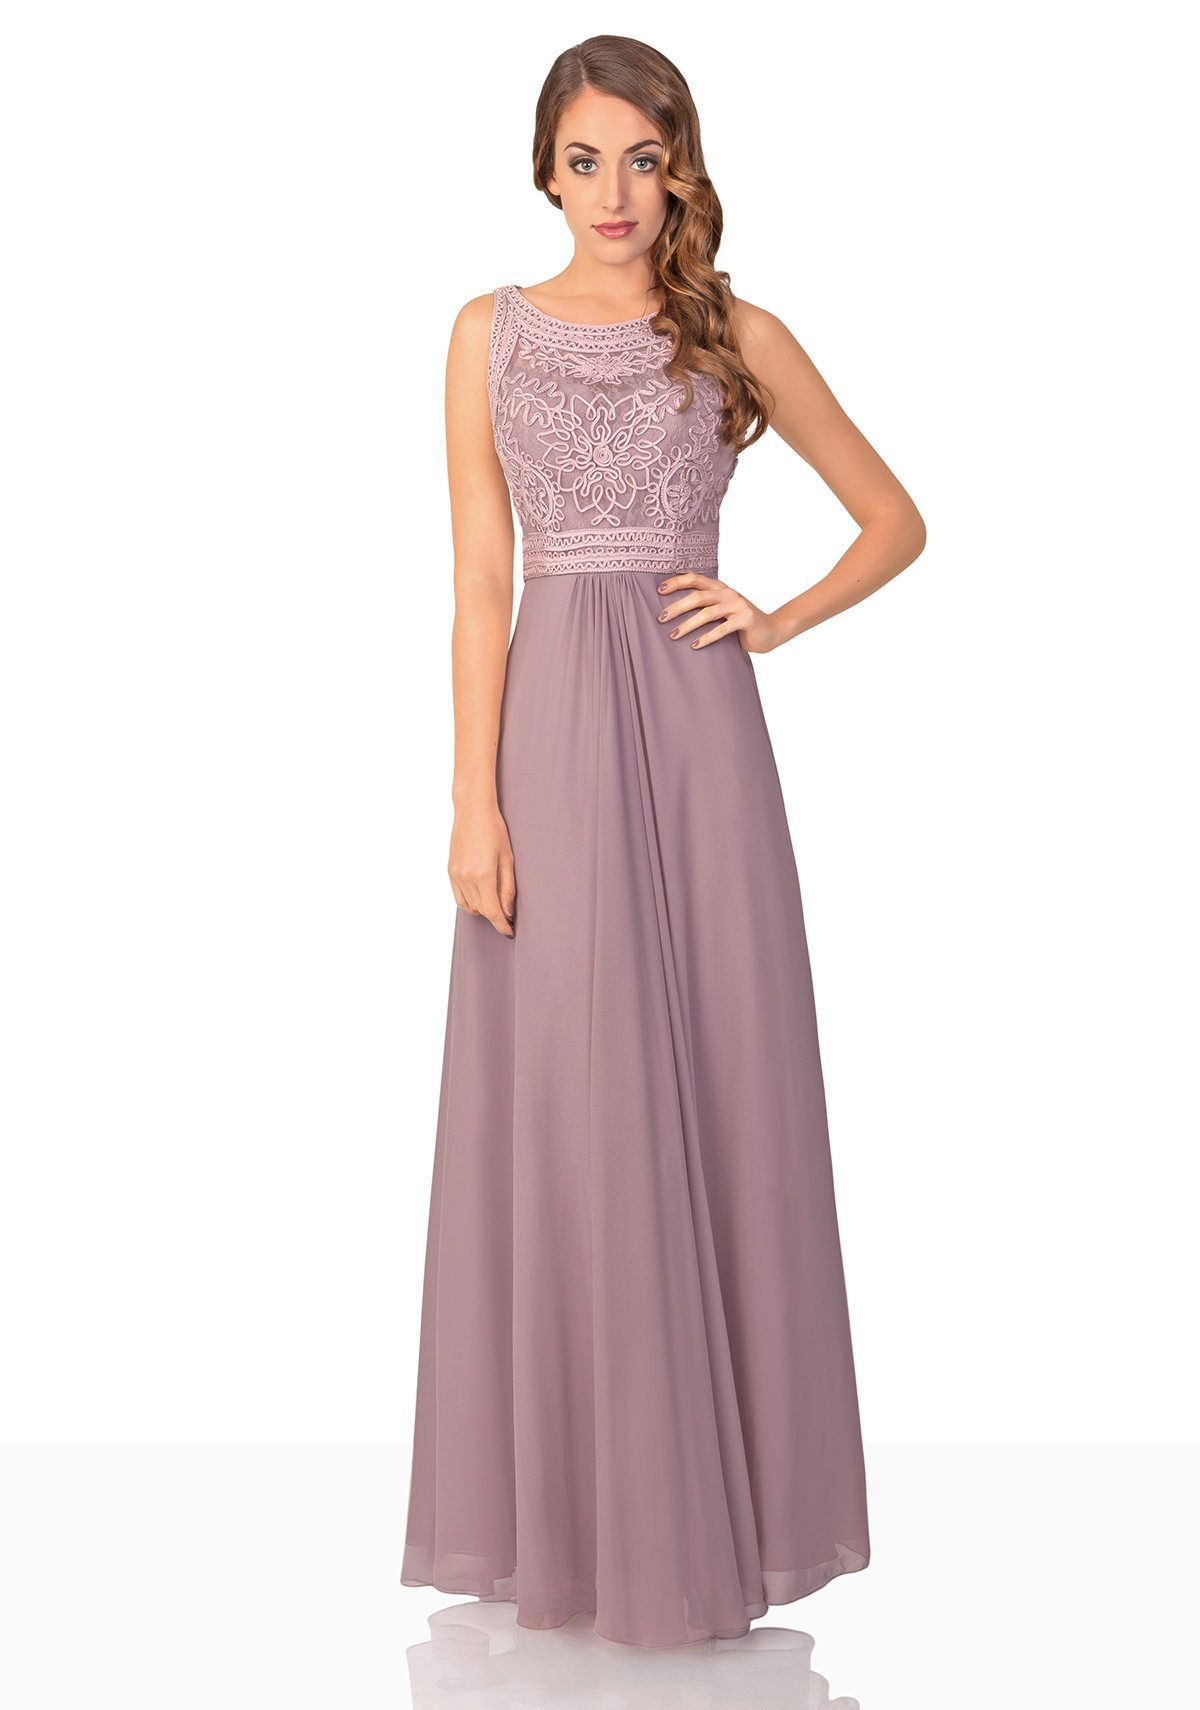 Formal Luxurius Abendkleid In Altrosa BoutiqueAbend Kreativ Abendkleid In Altrosa Boutique